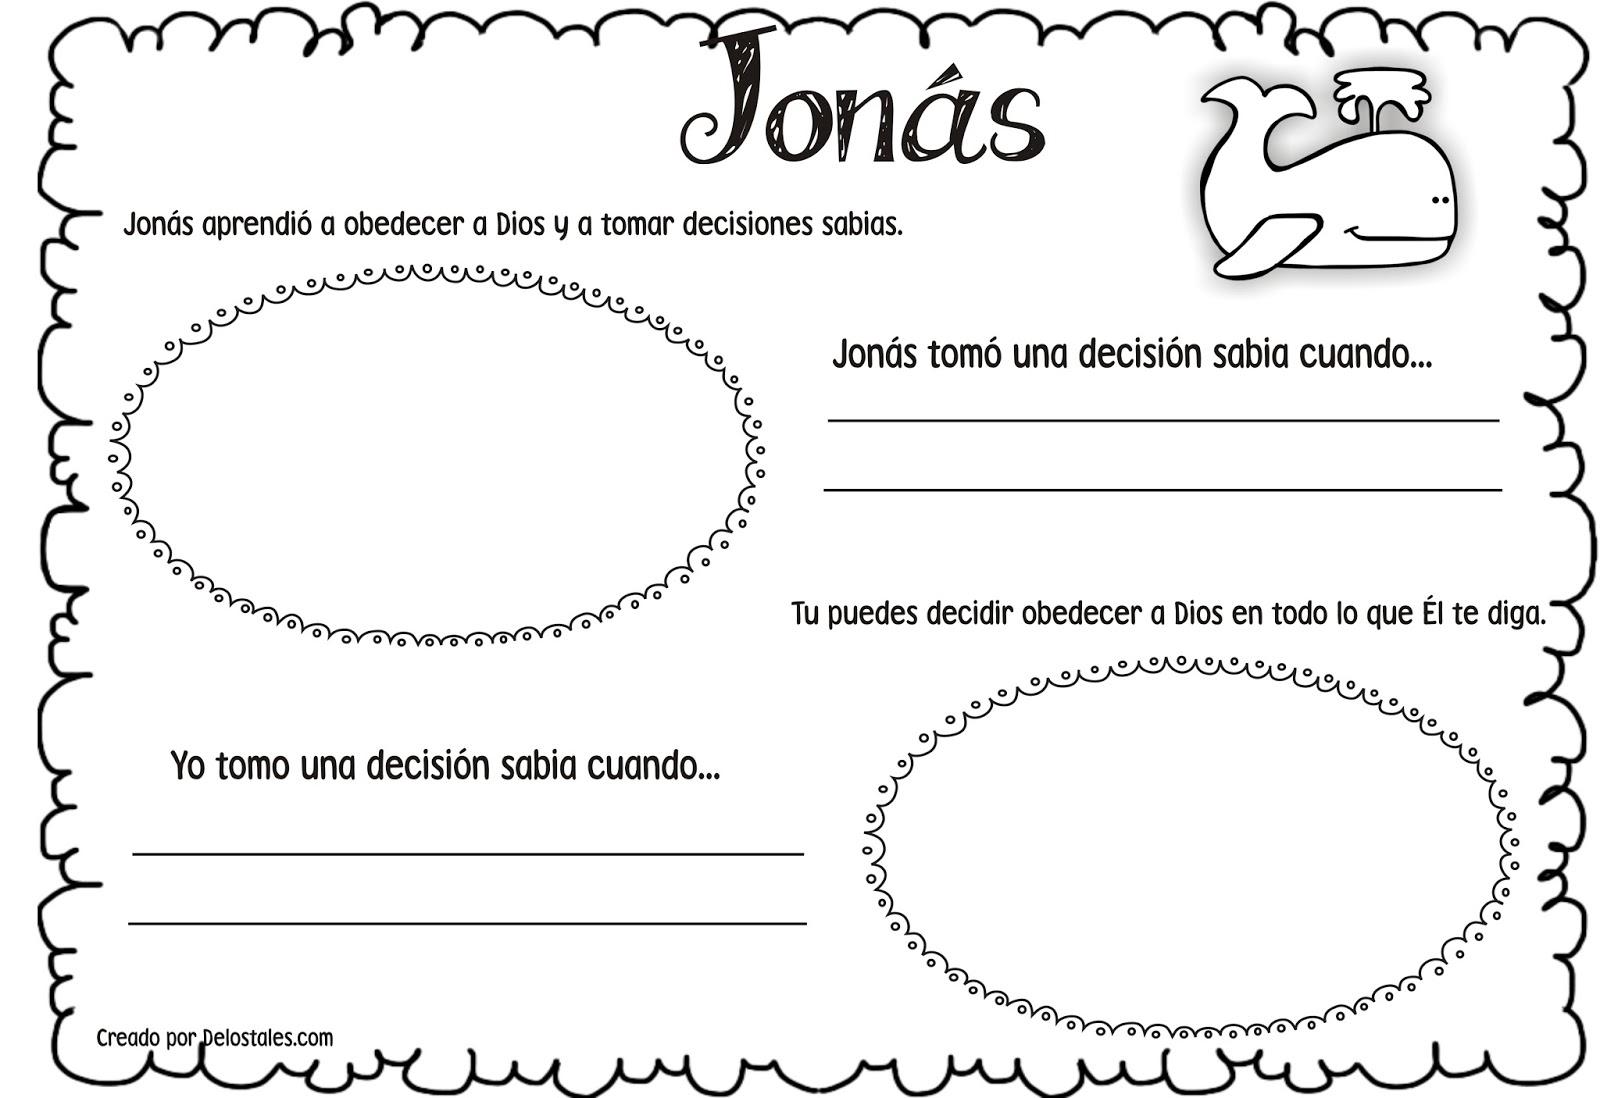 Vistoso Jonah Para Colorear Las Actividades Ideas - Dibujos Para ...